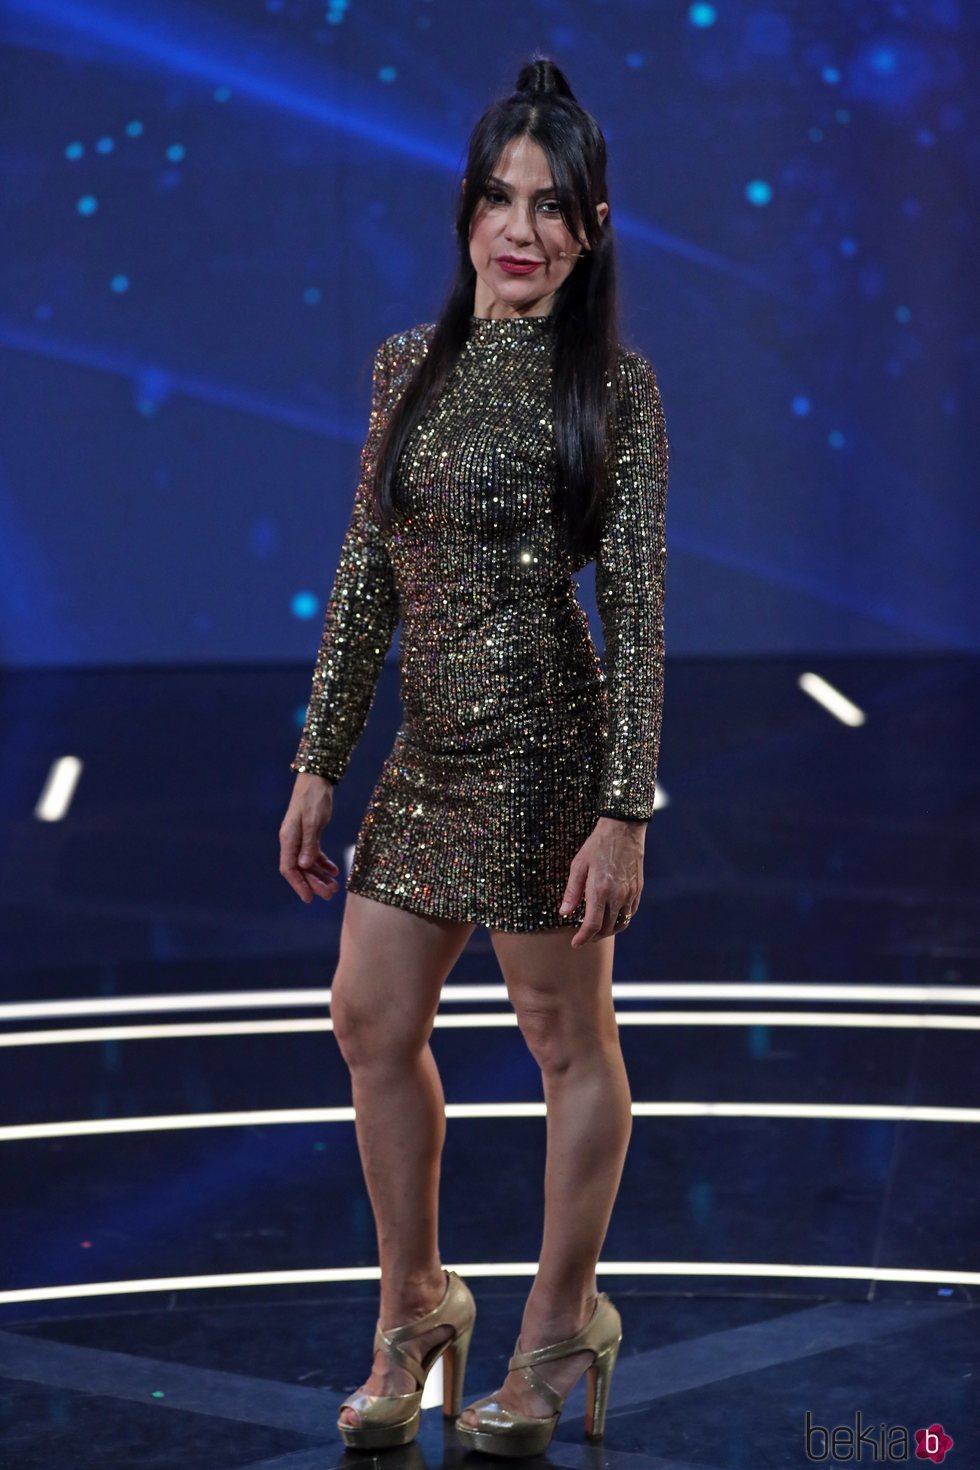 Maite Galdeano en la gala 5 de 'GH DÚO'